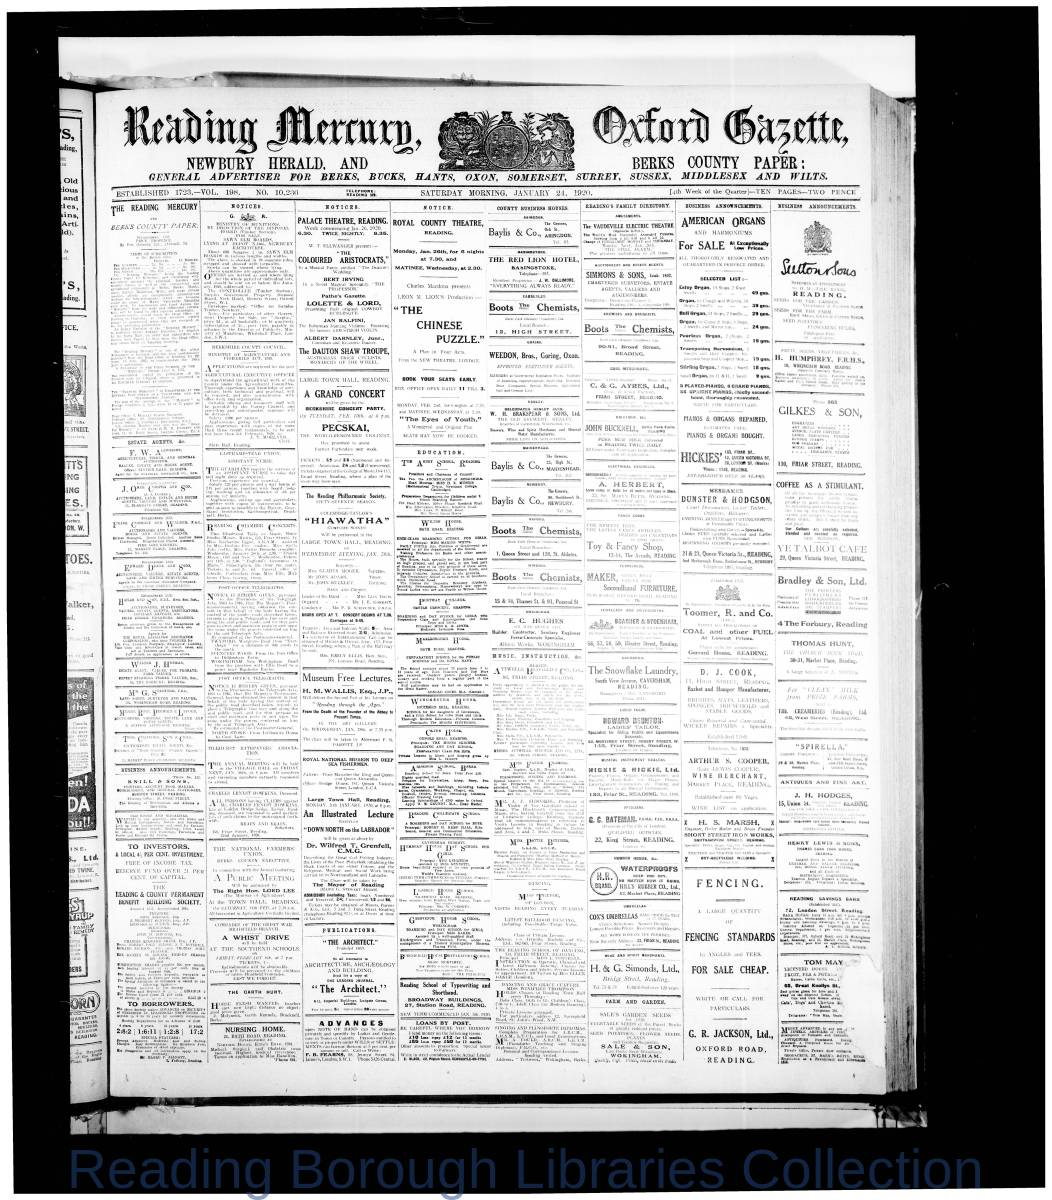 Reading Mercury Oxford Gazette Saturday , January 24,1920.  Pg 1